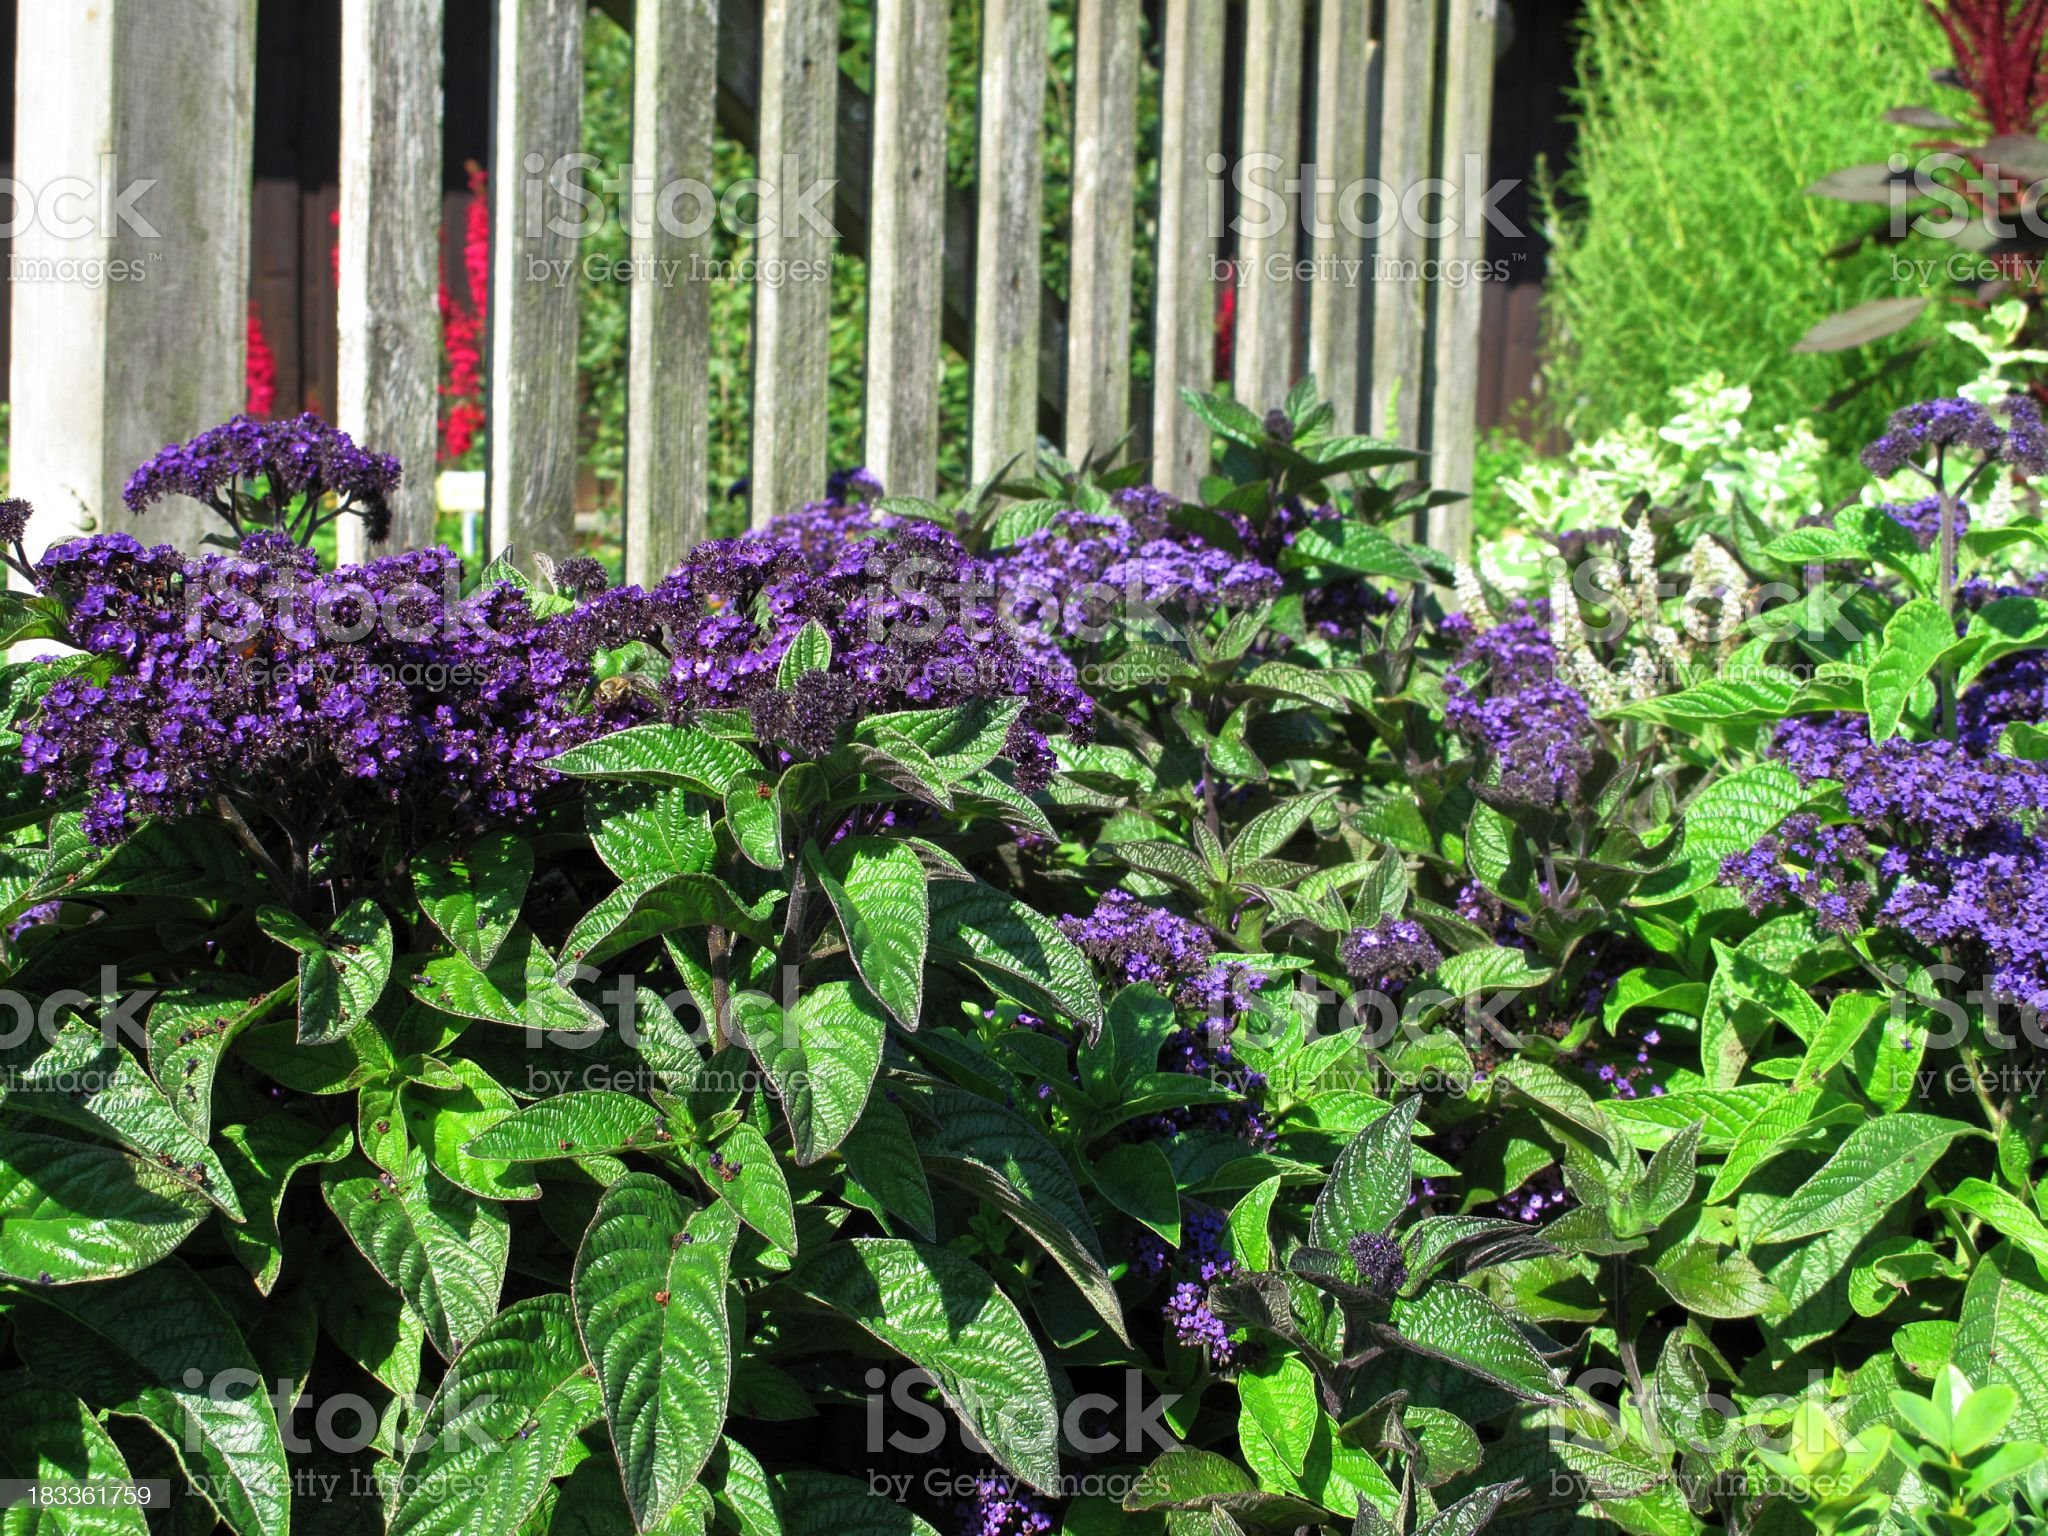 Heliotropium arborescens in herb garden royalty-free stock photo